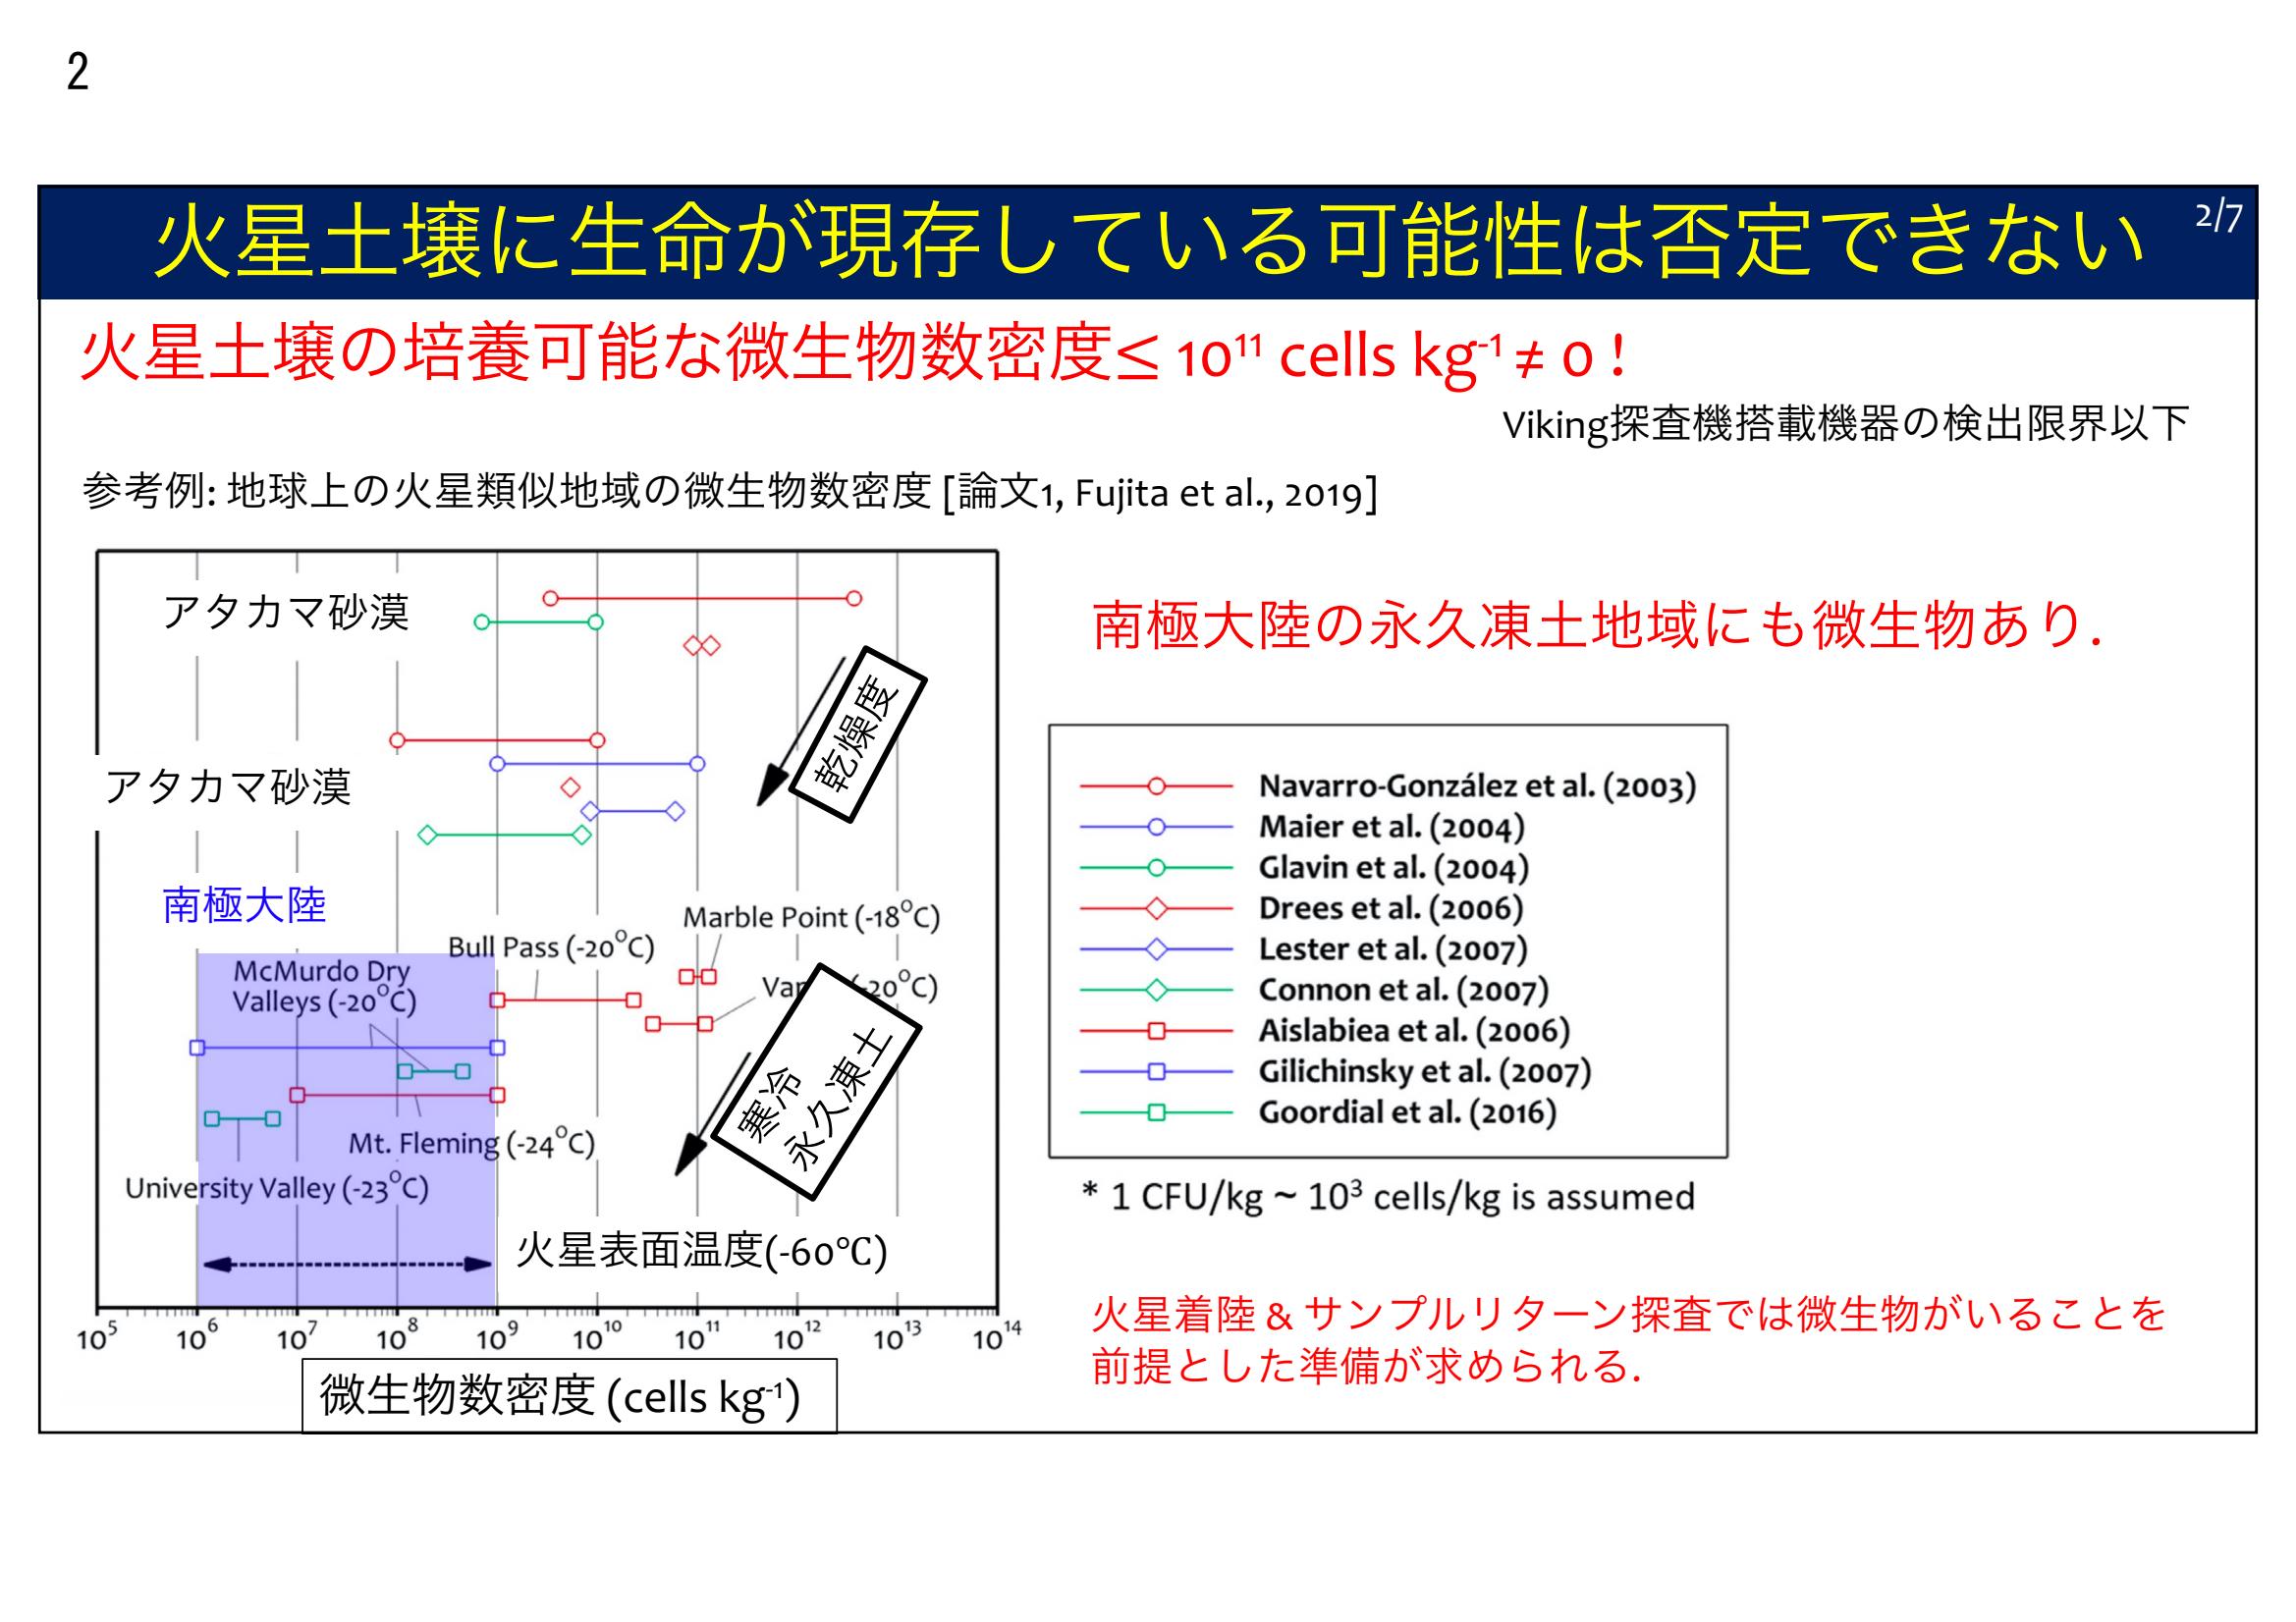 f:id:Imamura:20210819095343p:plain